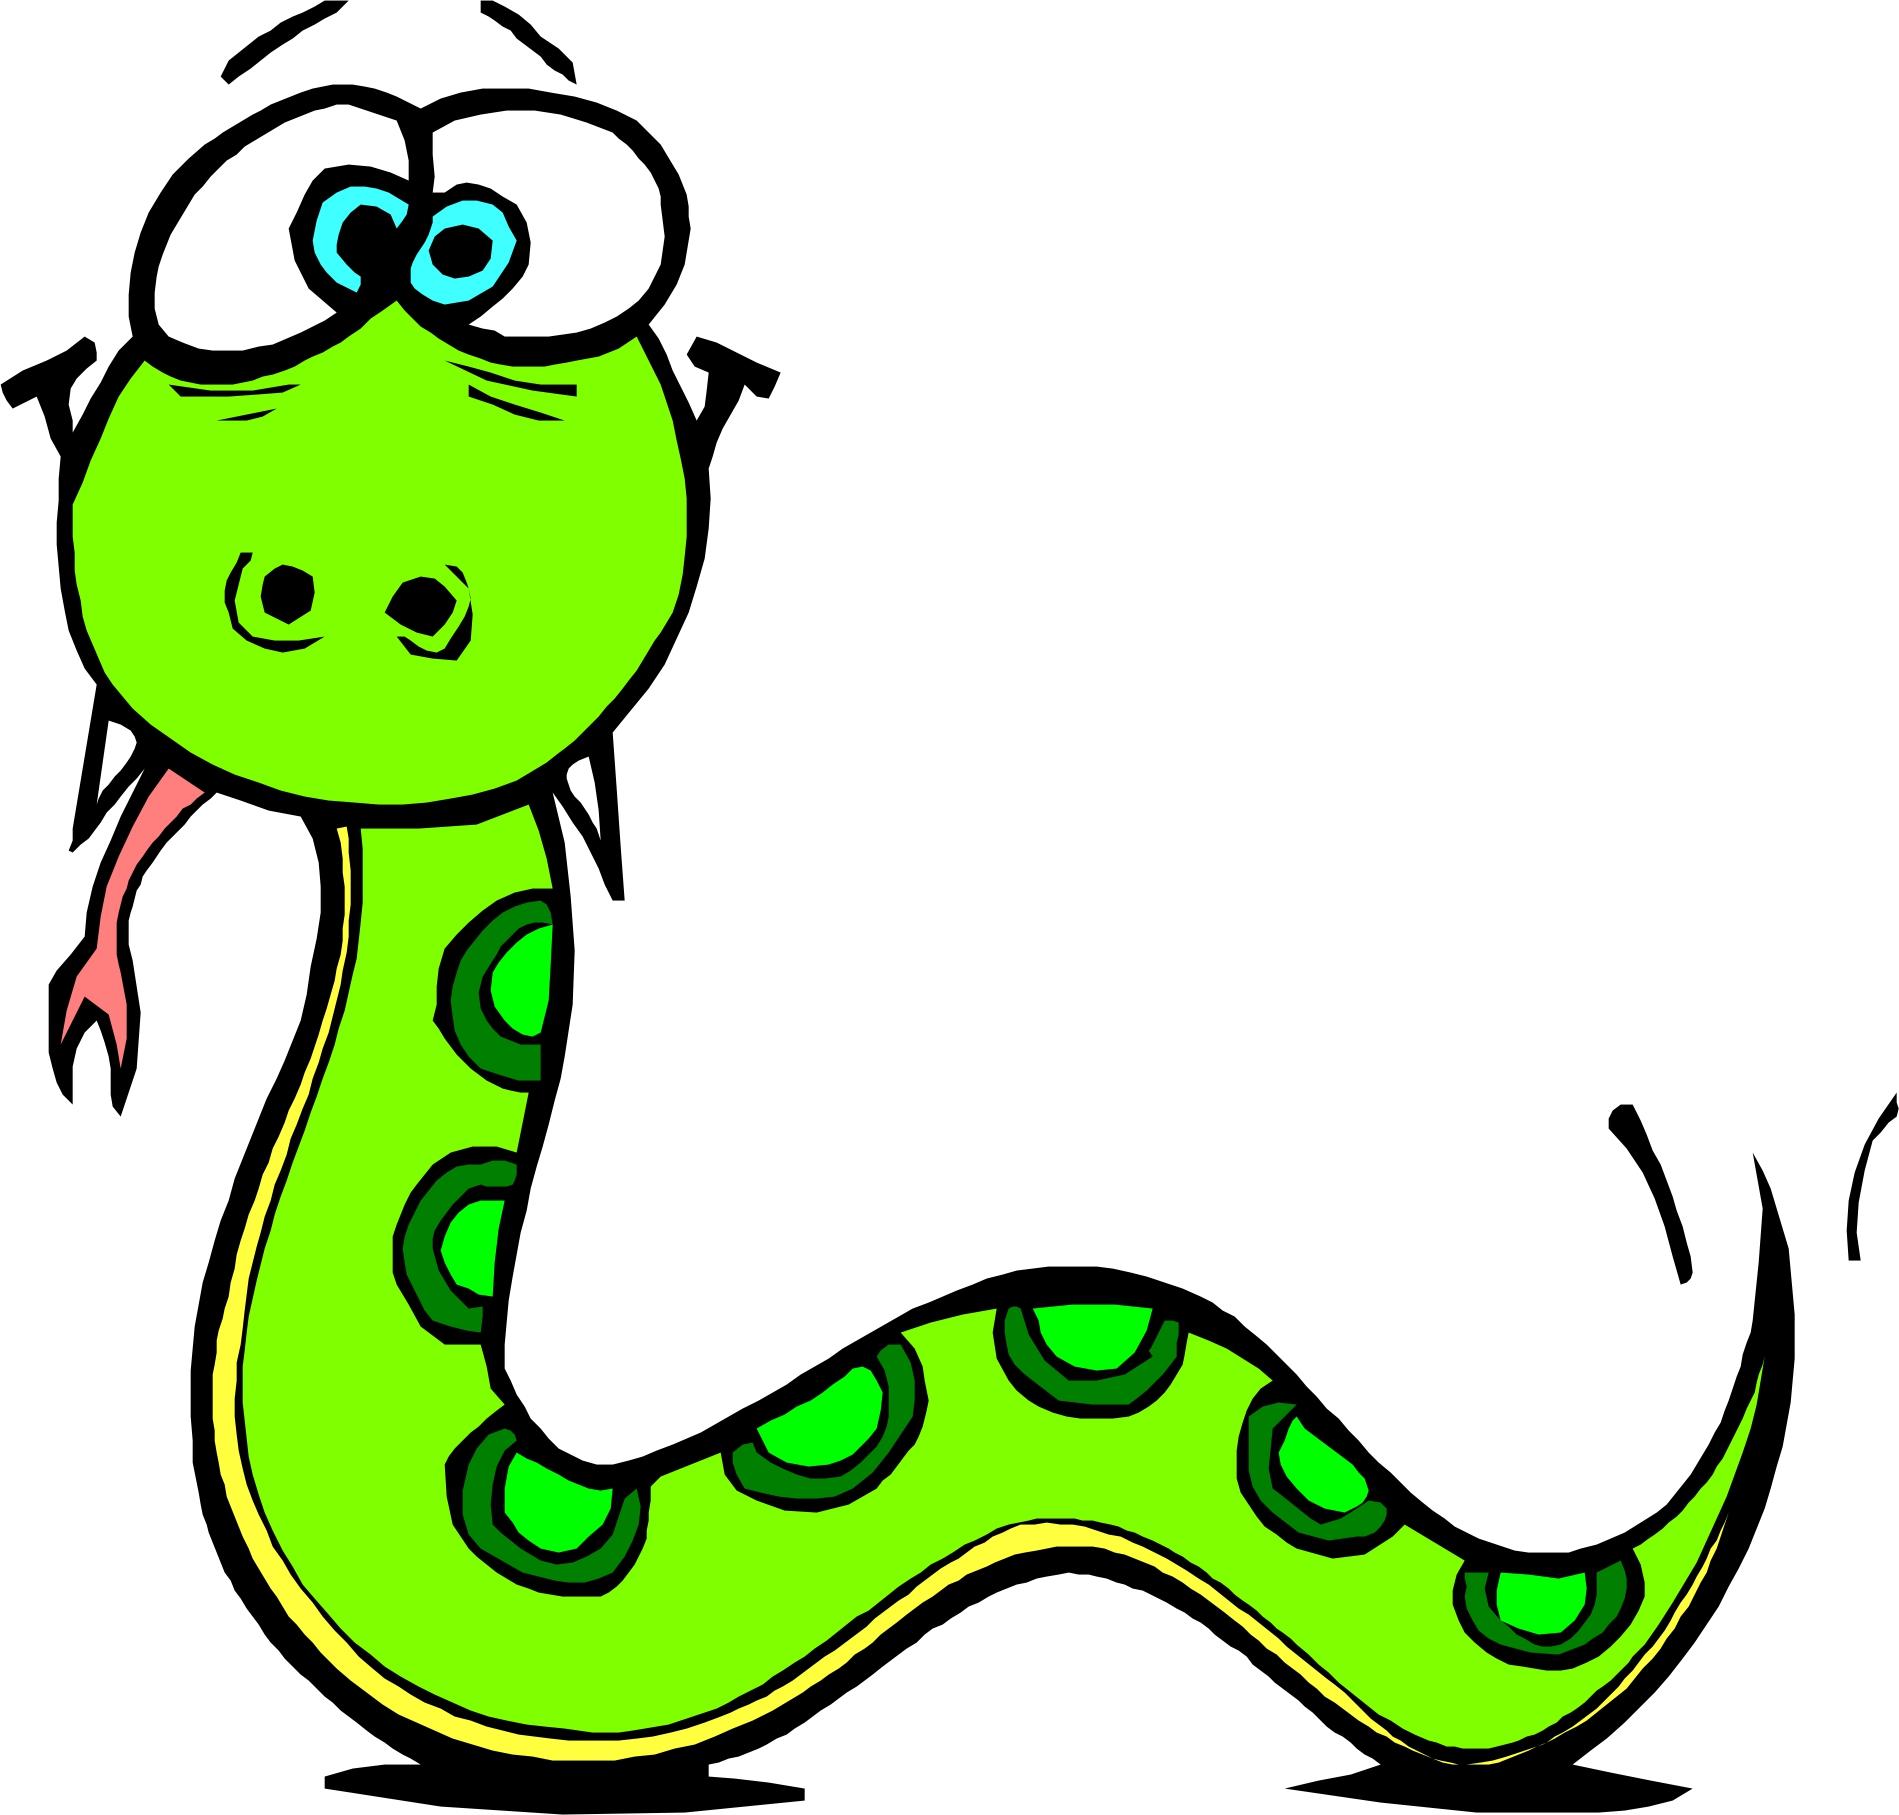 Snake clipart Art Clipart Free snake%20clipart Images